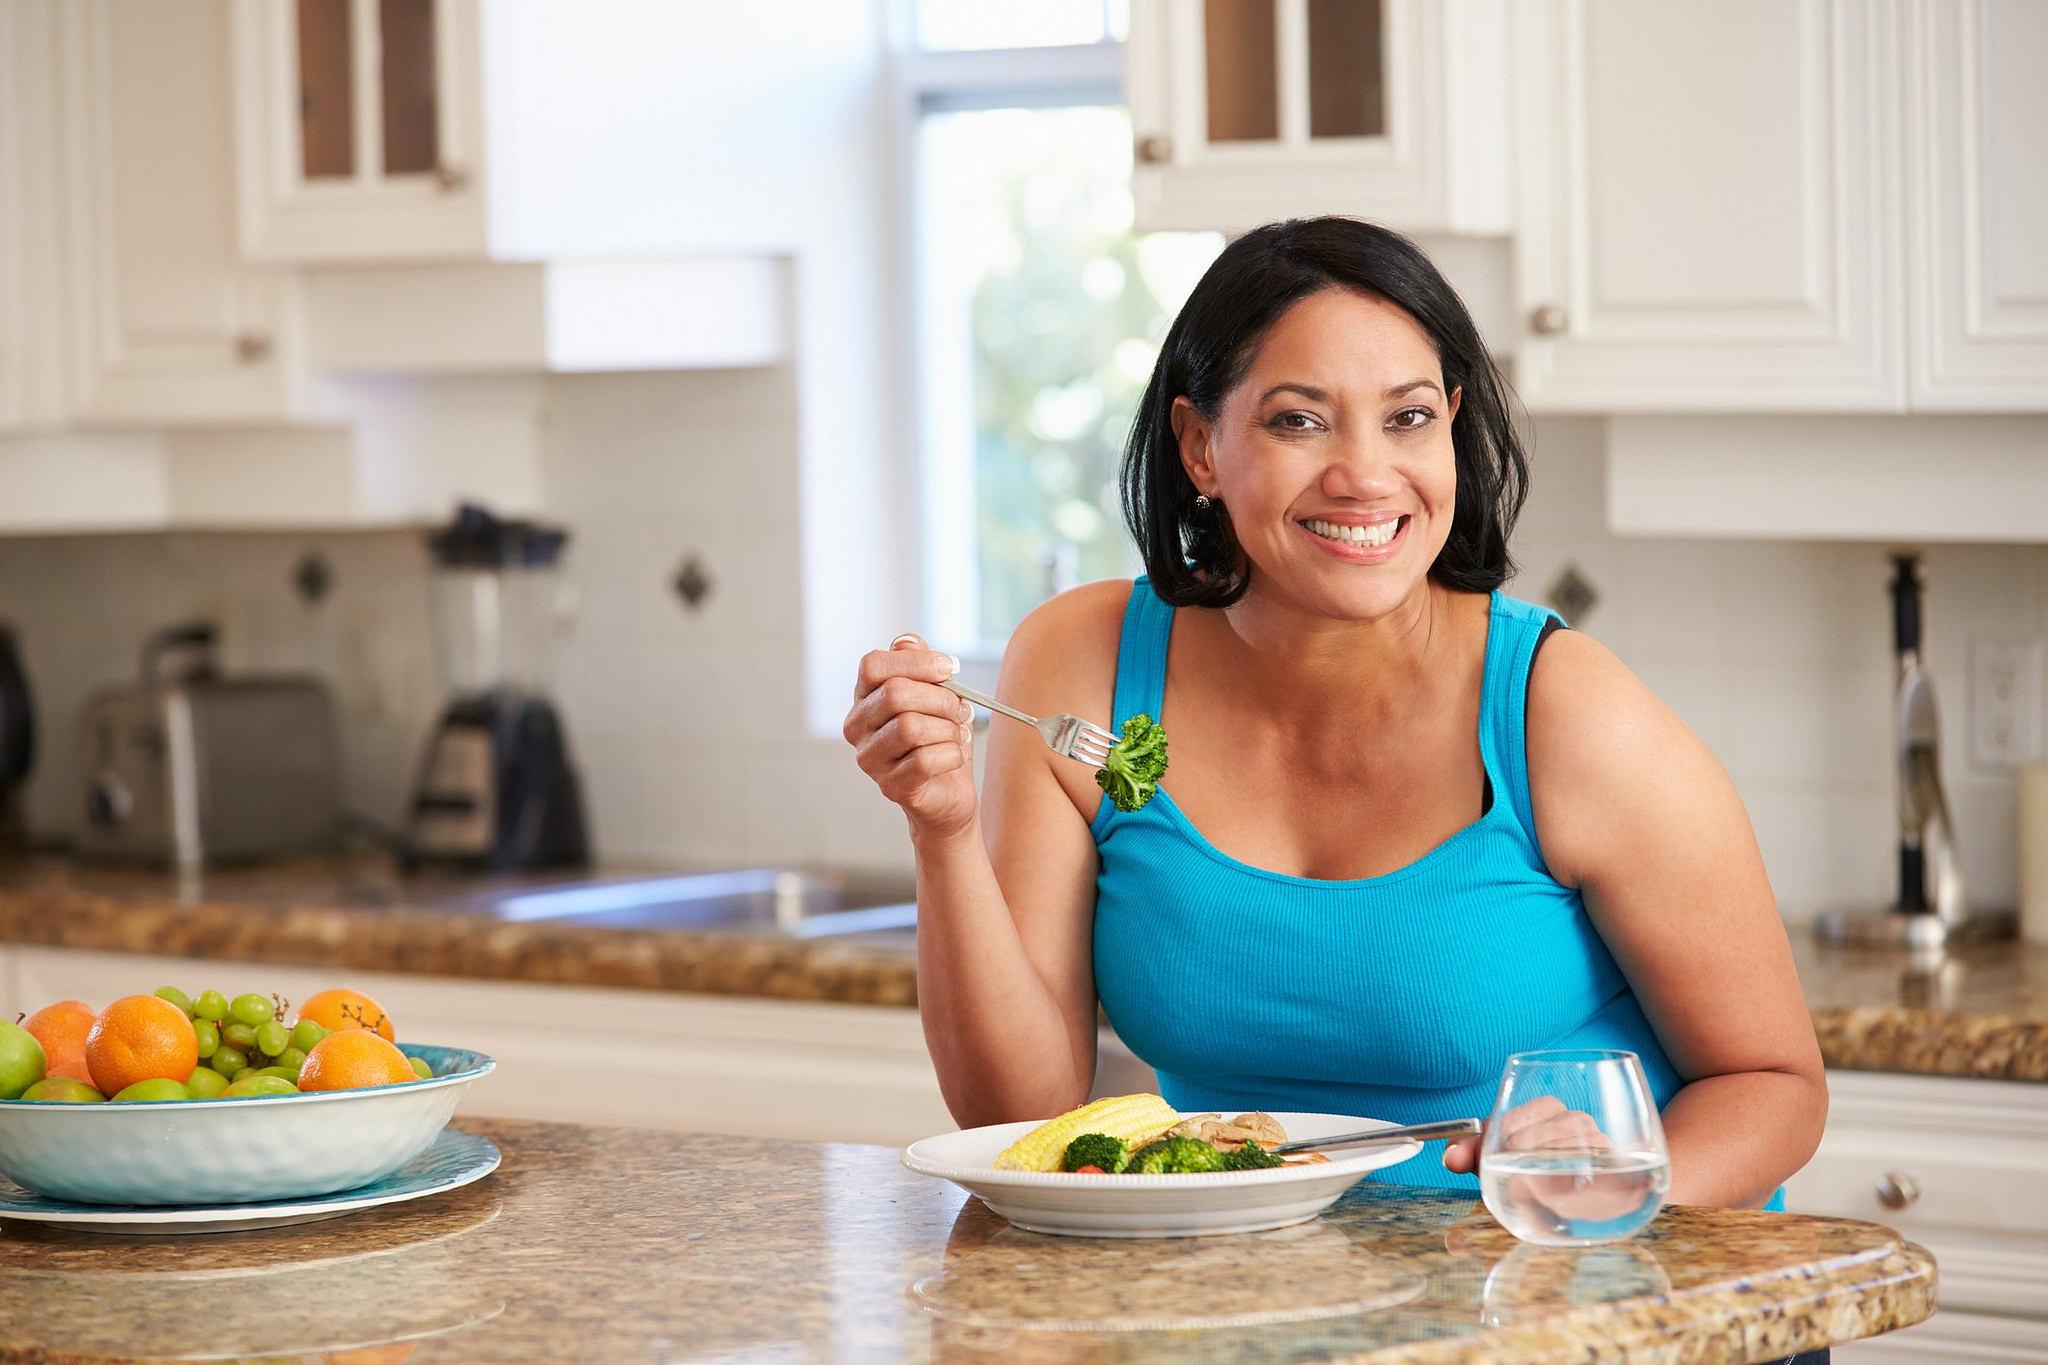 Картинка о диете, картинки